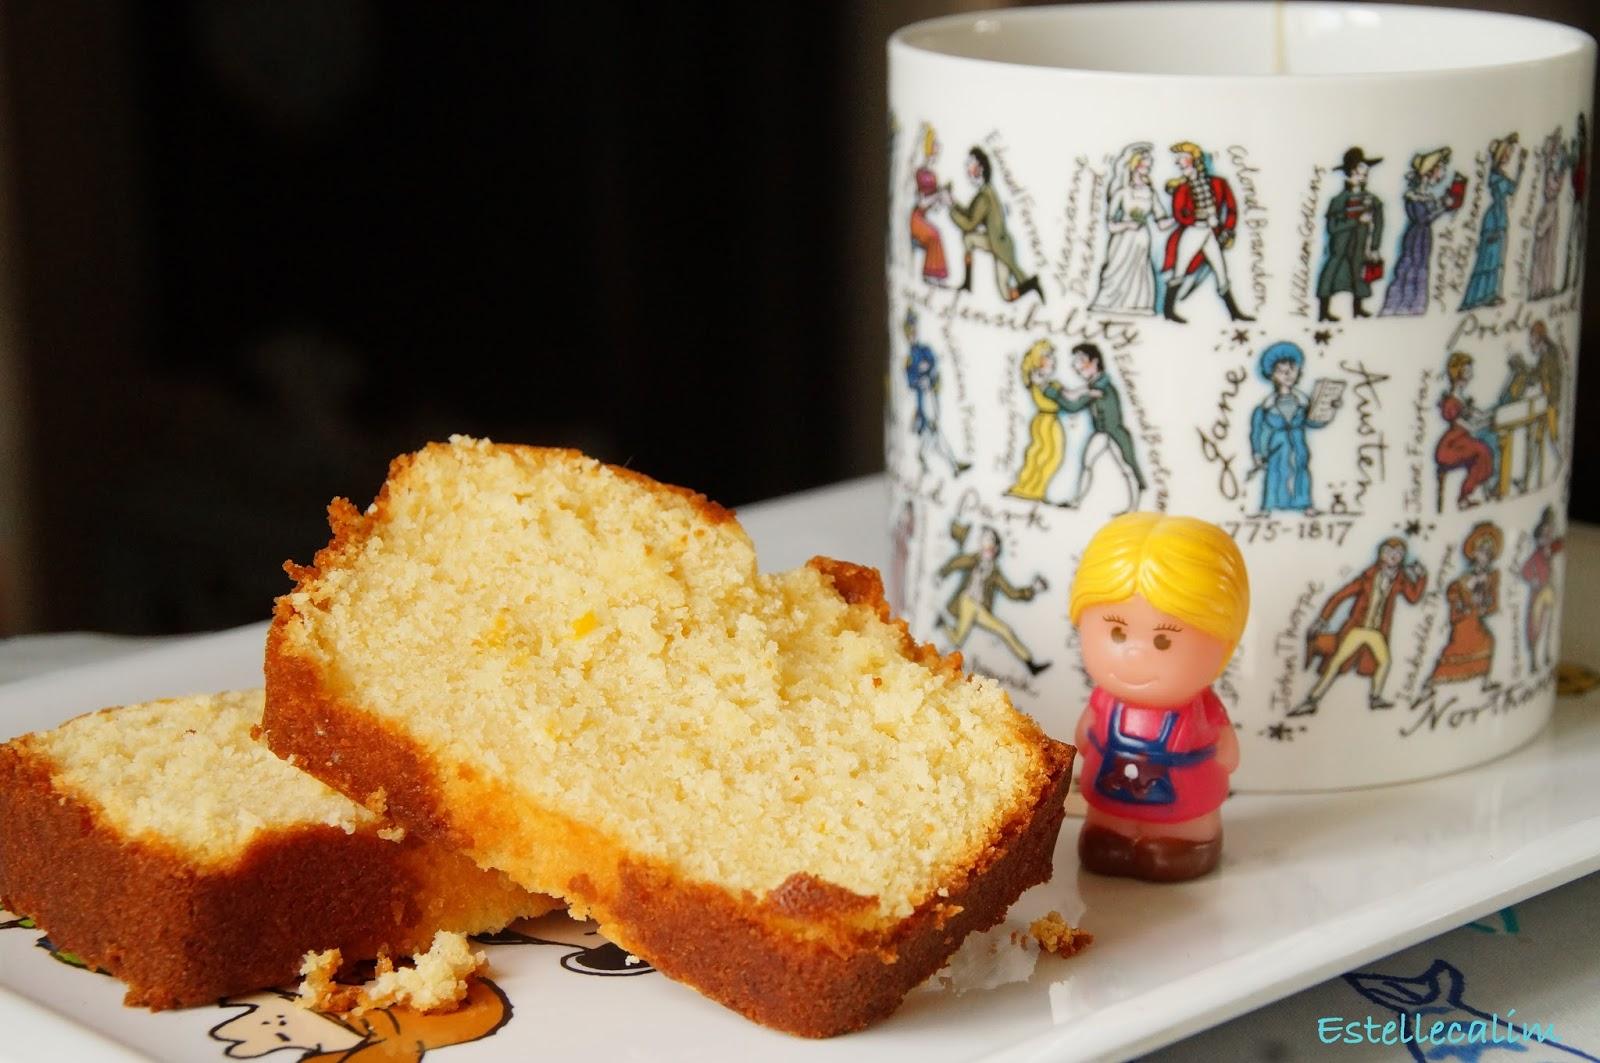 Recette Cake Petits Pois Micro Onde Szns Beurre